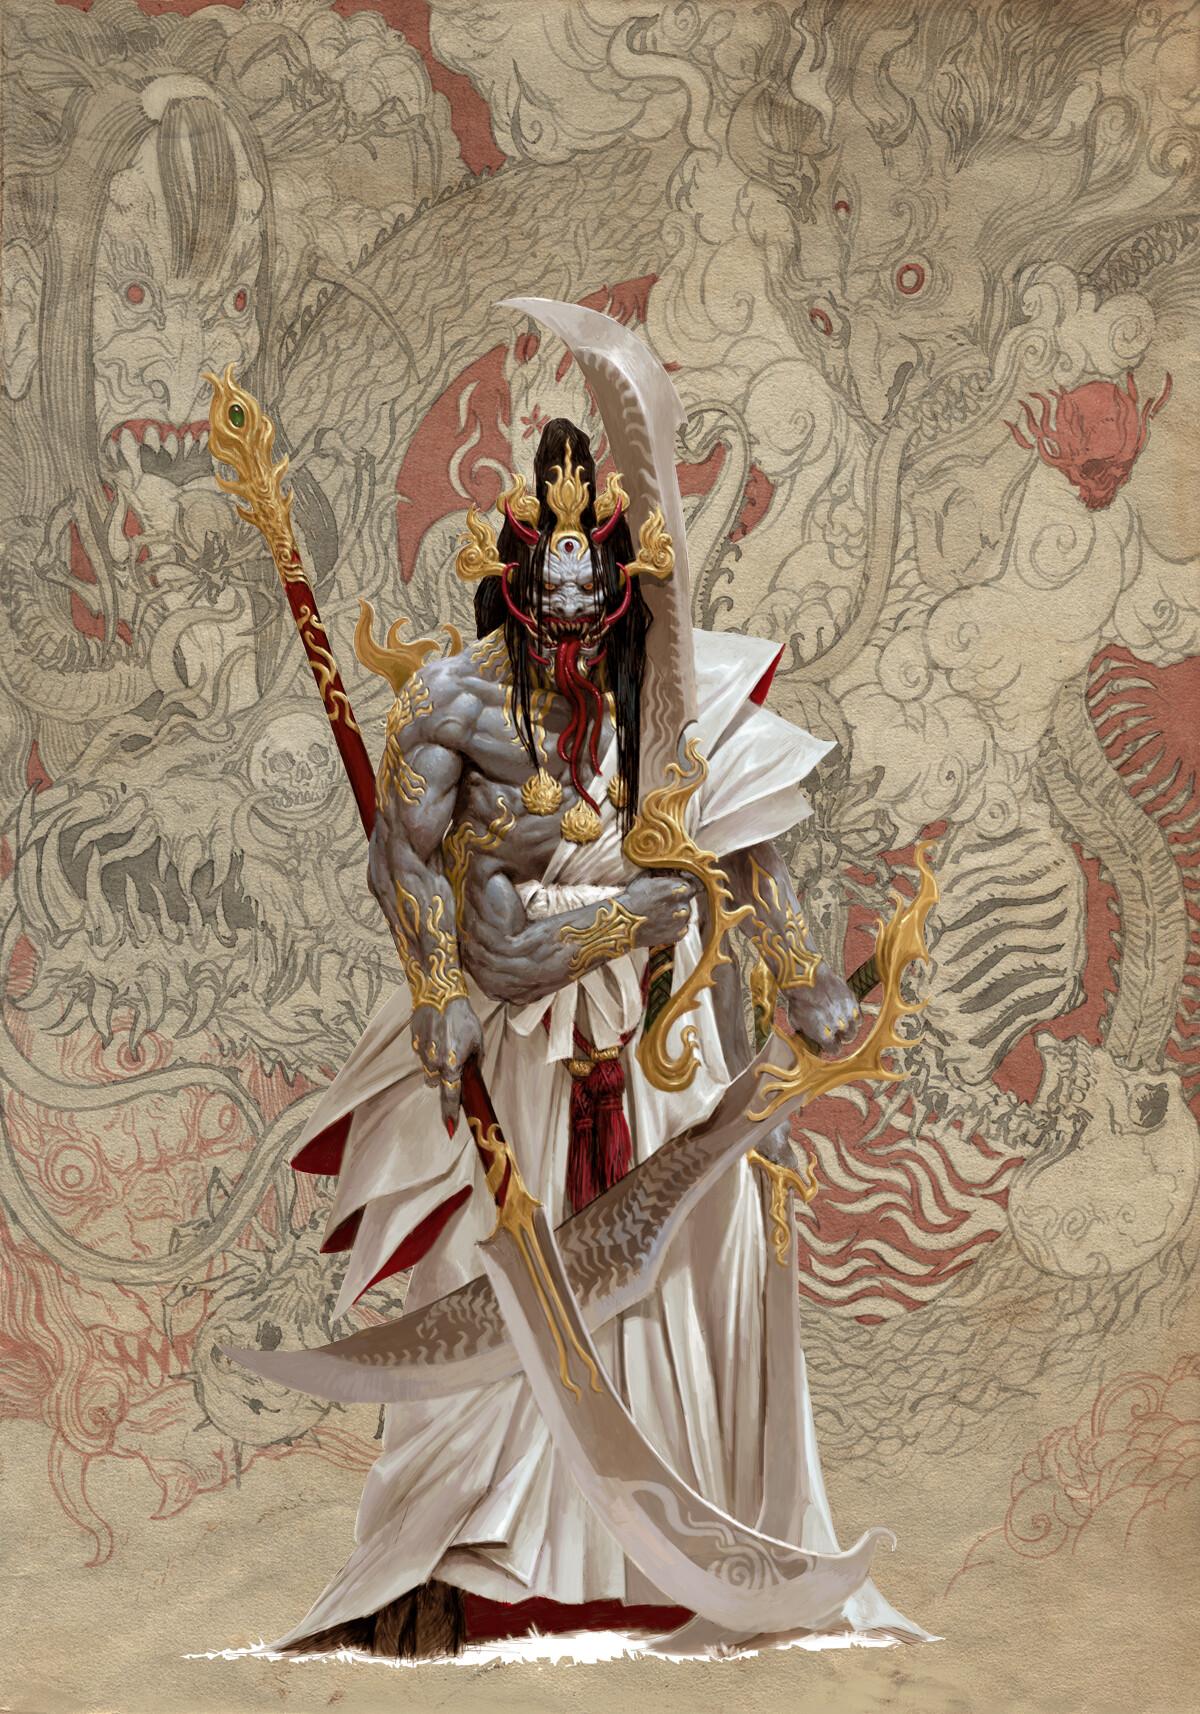 Adrian smith monster demon 1